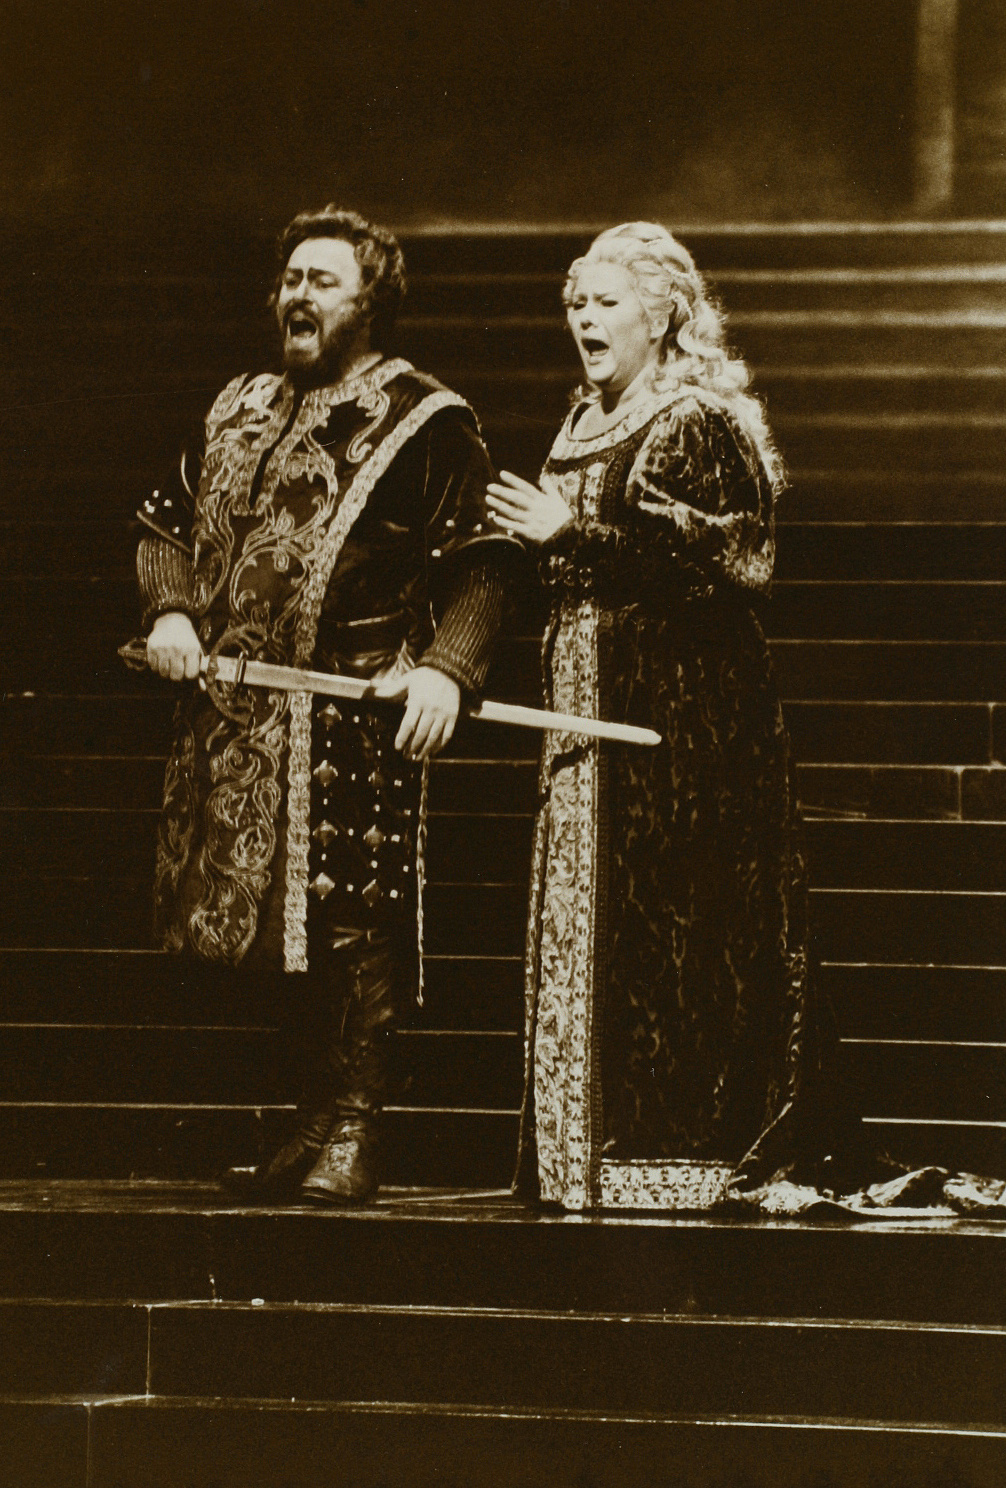 Trubadur-LPavarottiesEva-MetropolitanOpera-1987-132803.jpg